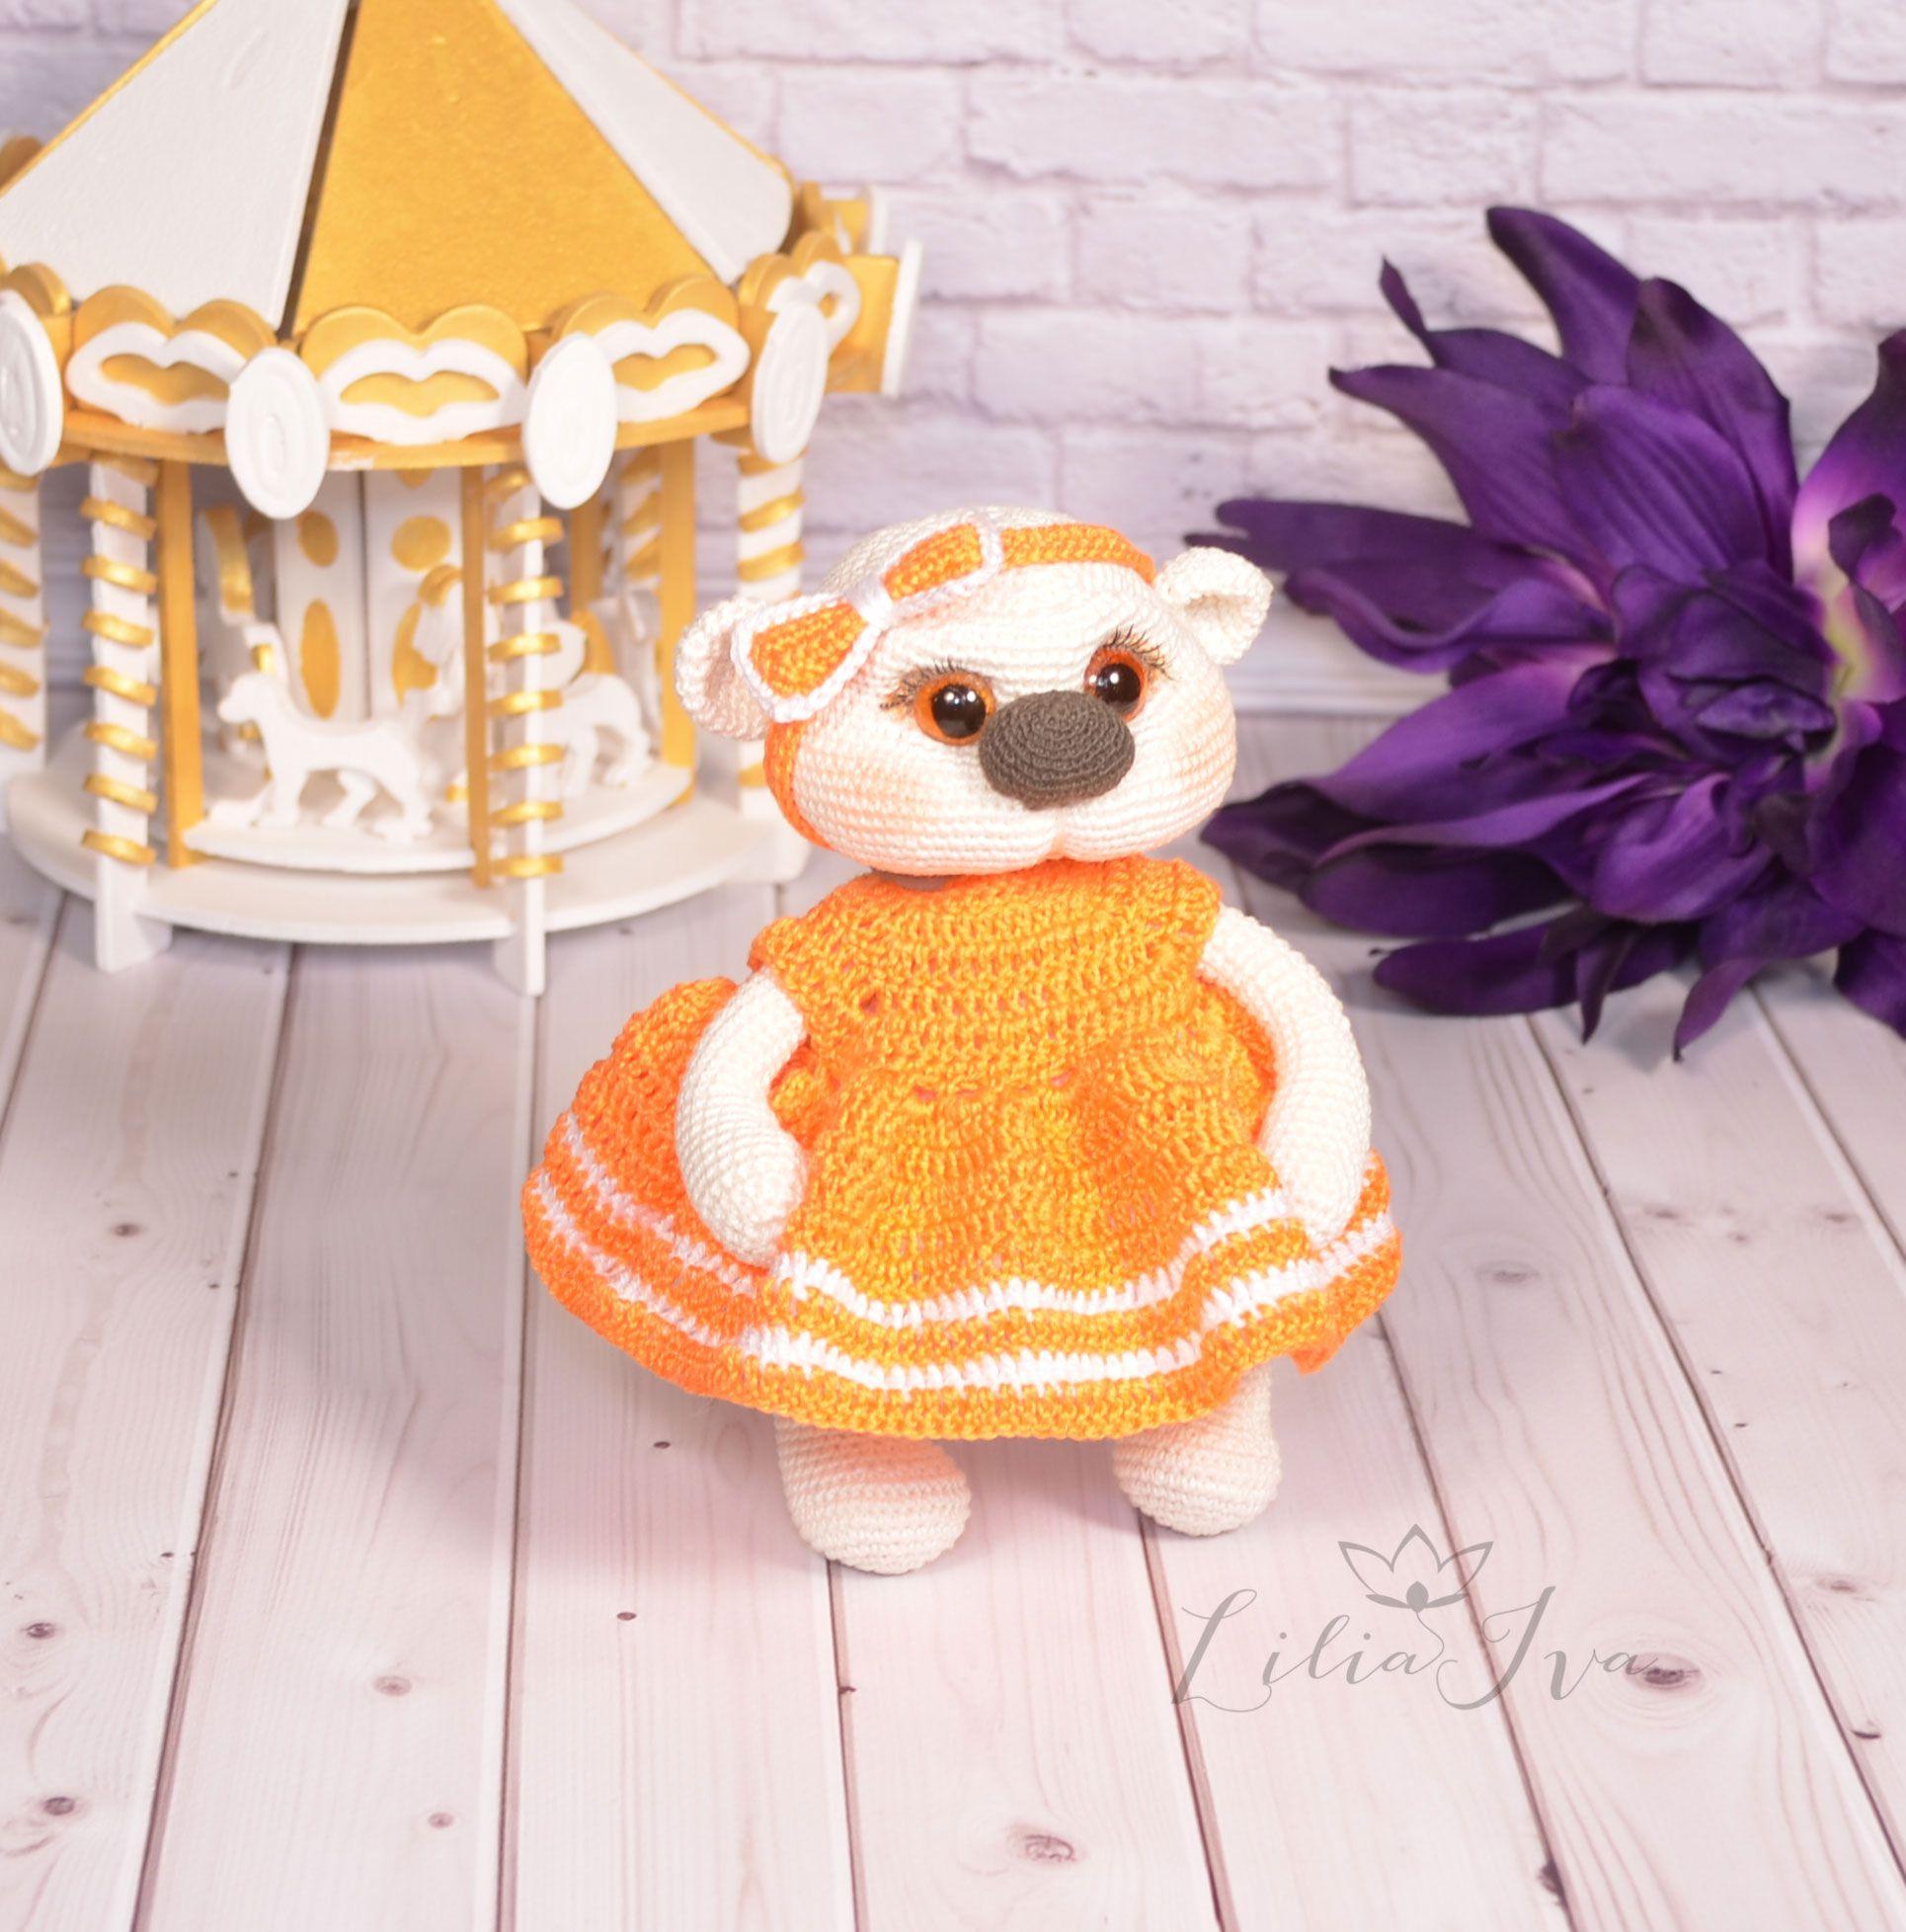 авторскаяигрушка медвежонок купитьмишку мишкатедди купитьигрушкуручнойработы купитьмишкутедди вязанаяигрушка мишка медведь амигуруми мягкаяигрушка мишкаручнойработы